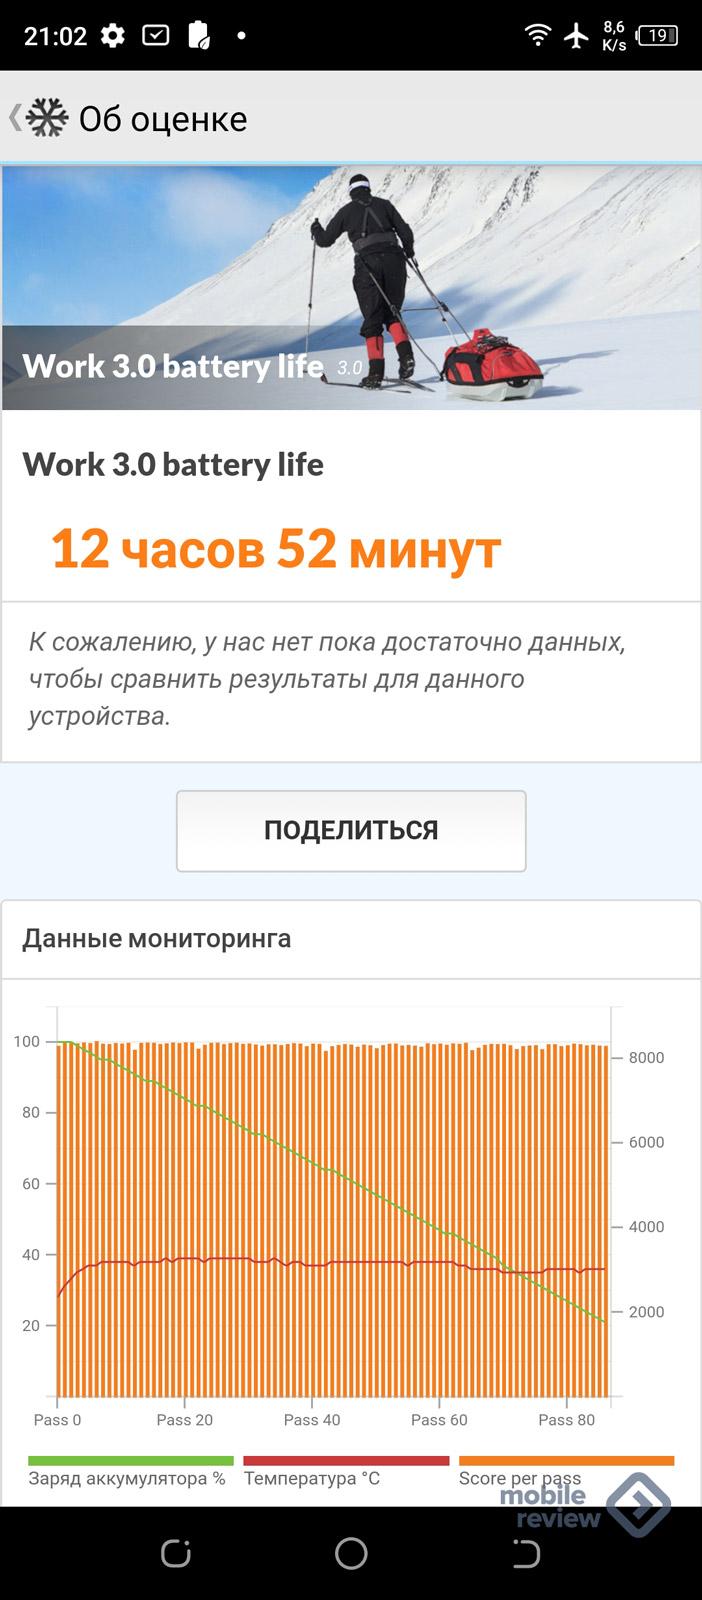 Обзор Tecno Pova 2: мощный аккумулятор, NFC, 48МП камера за 12990 рублей